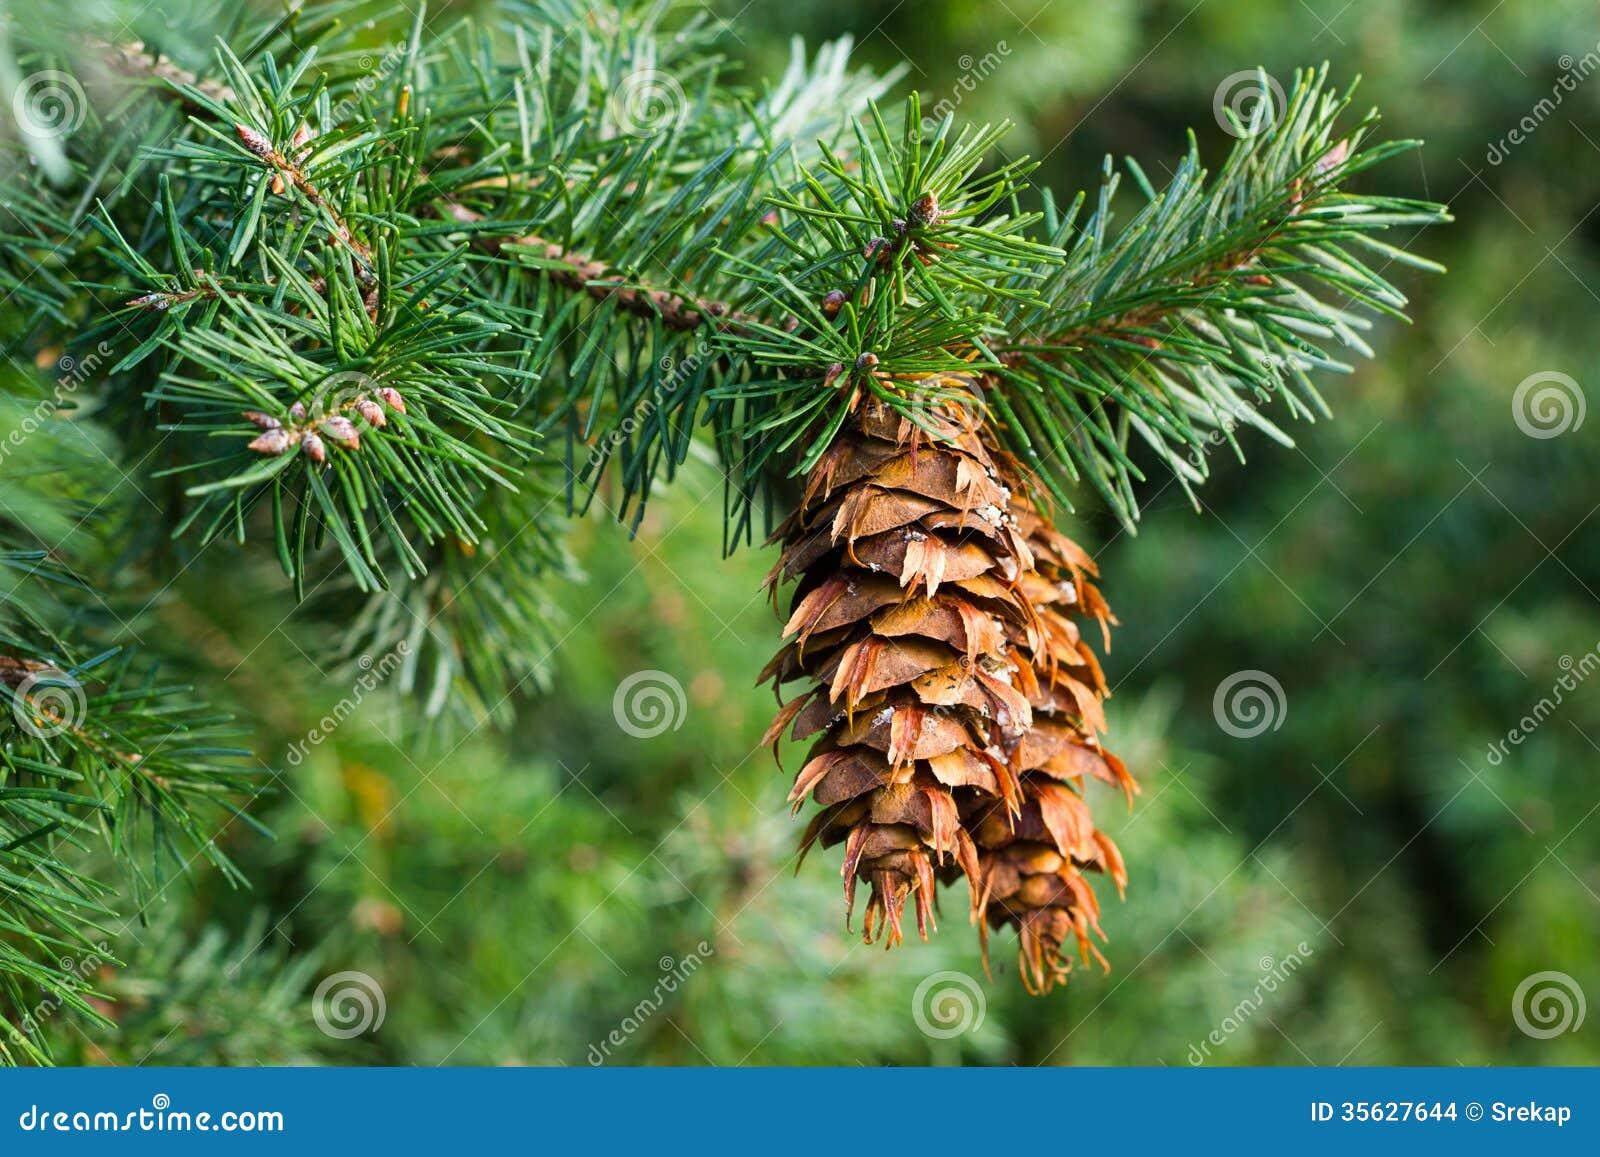 7 5 Douglas Fir Christmas Tree